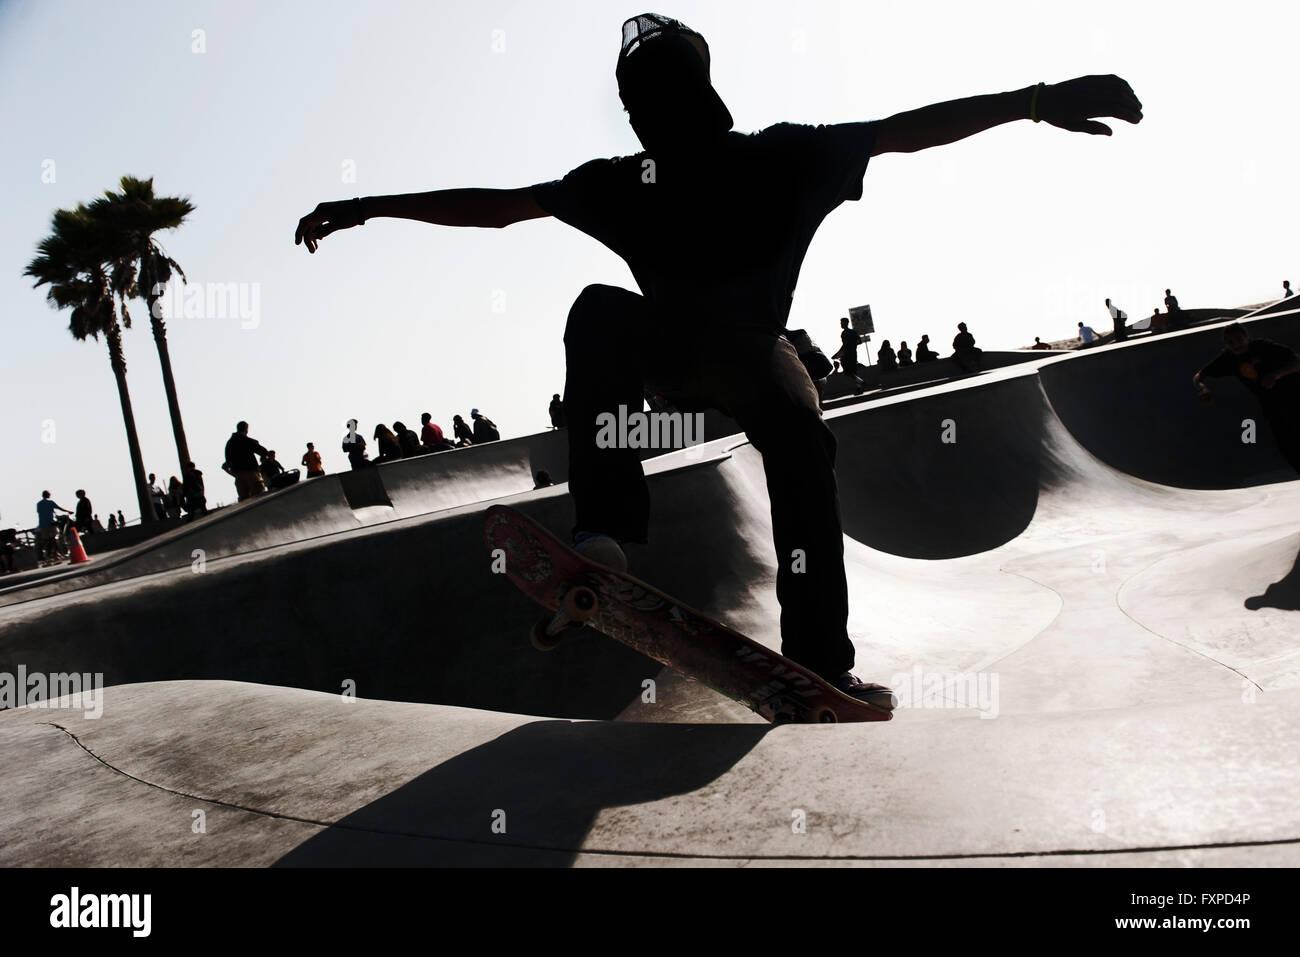 Joven patinaje en Skate Park Imagen De Stock